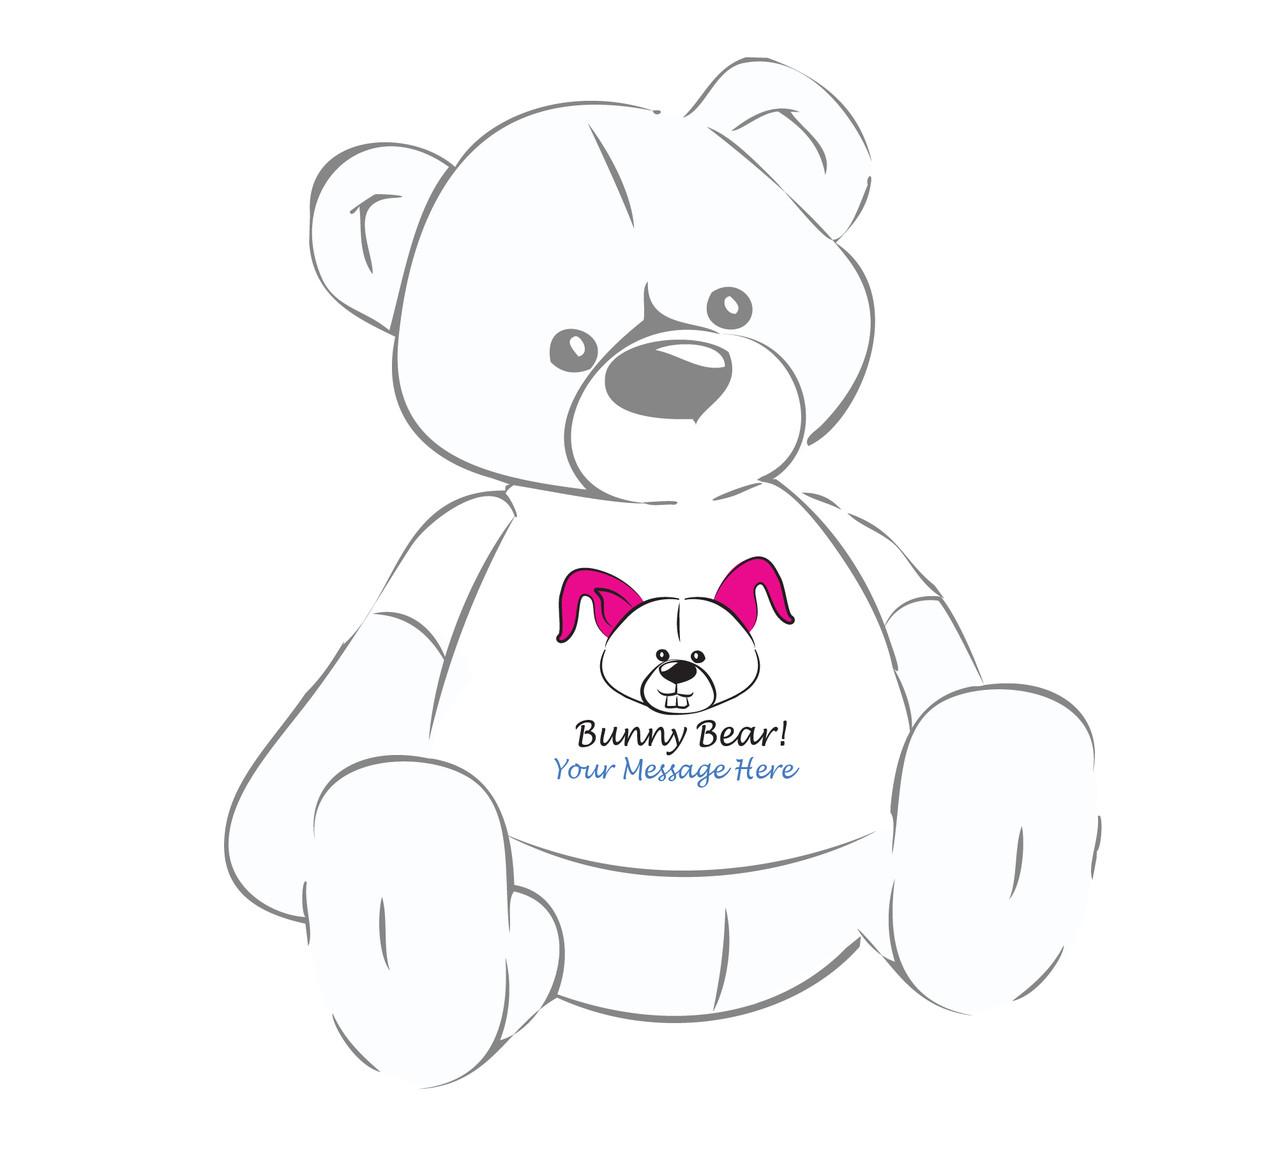 Personalized Bunny Bear! Giant Teddy Bear Easter shirta